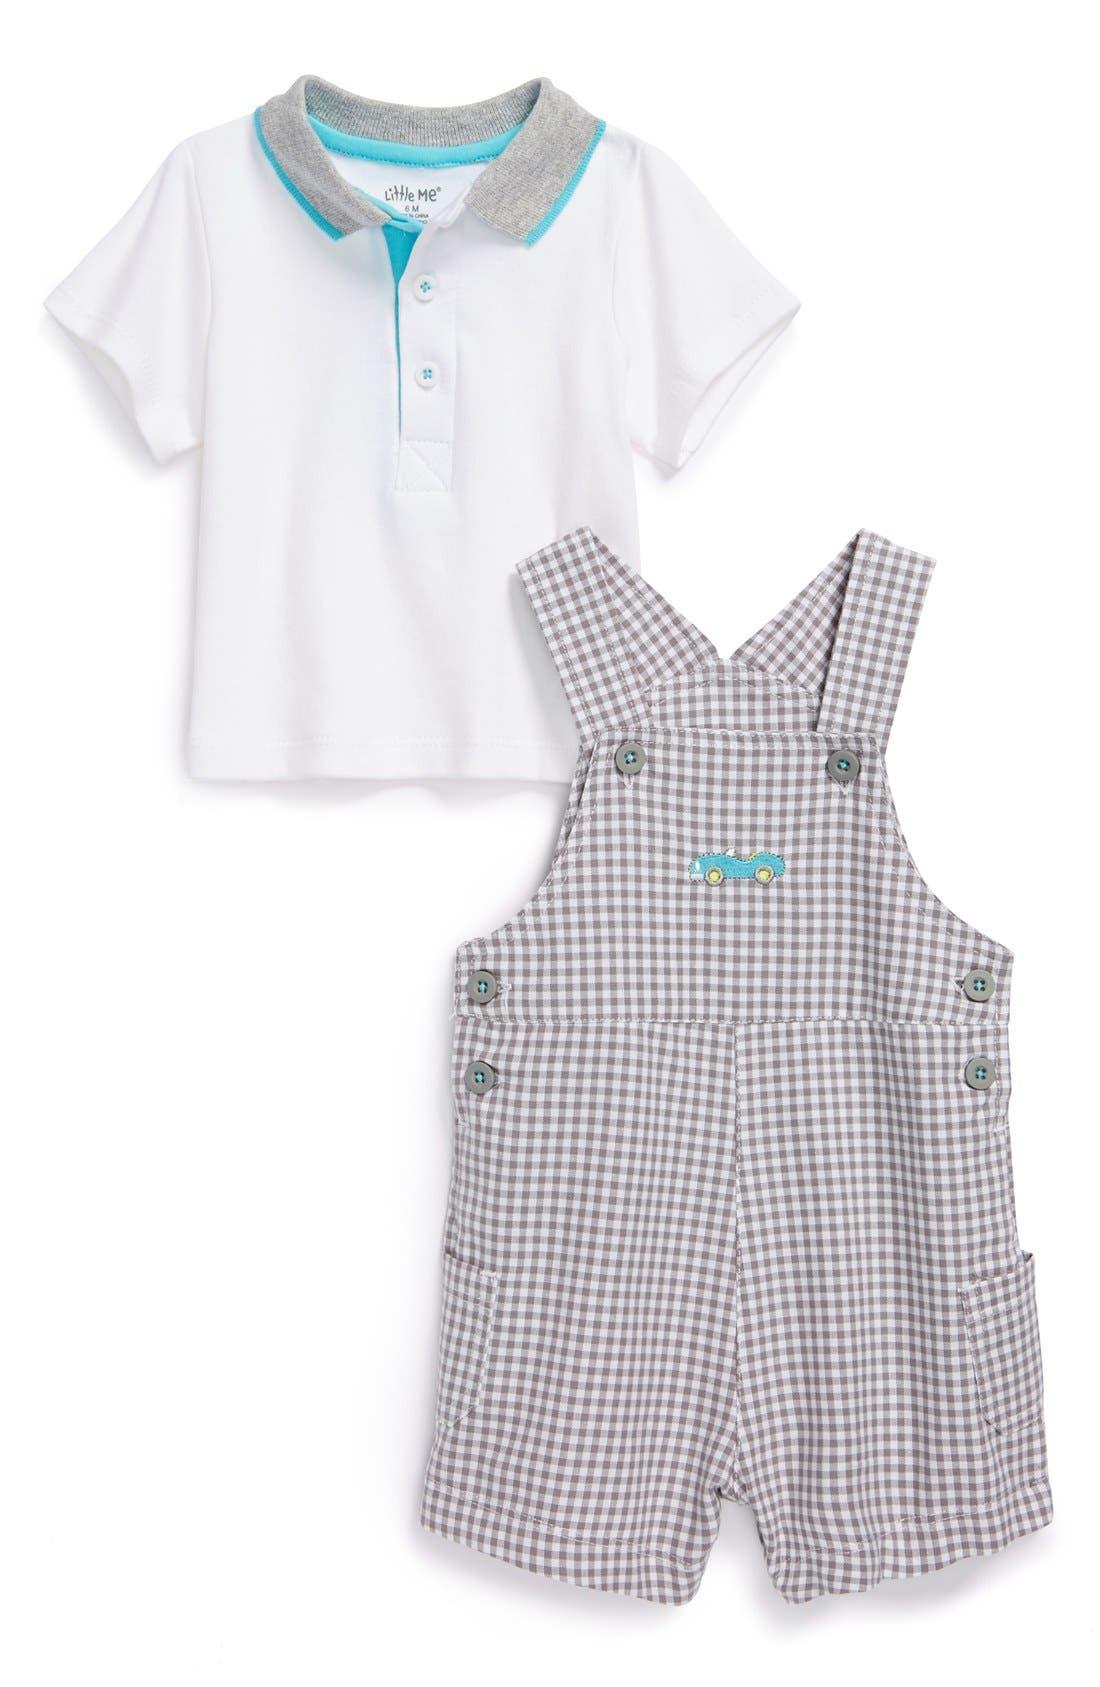 Alternate Image 1 Selected - Little Me 'Automobile' Polo Shirt & Shortalls (Baby Boys)